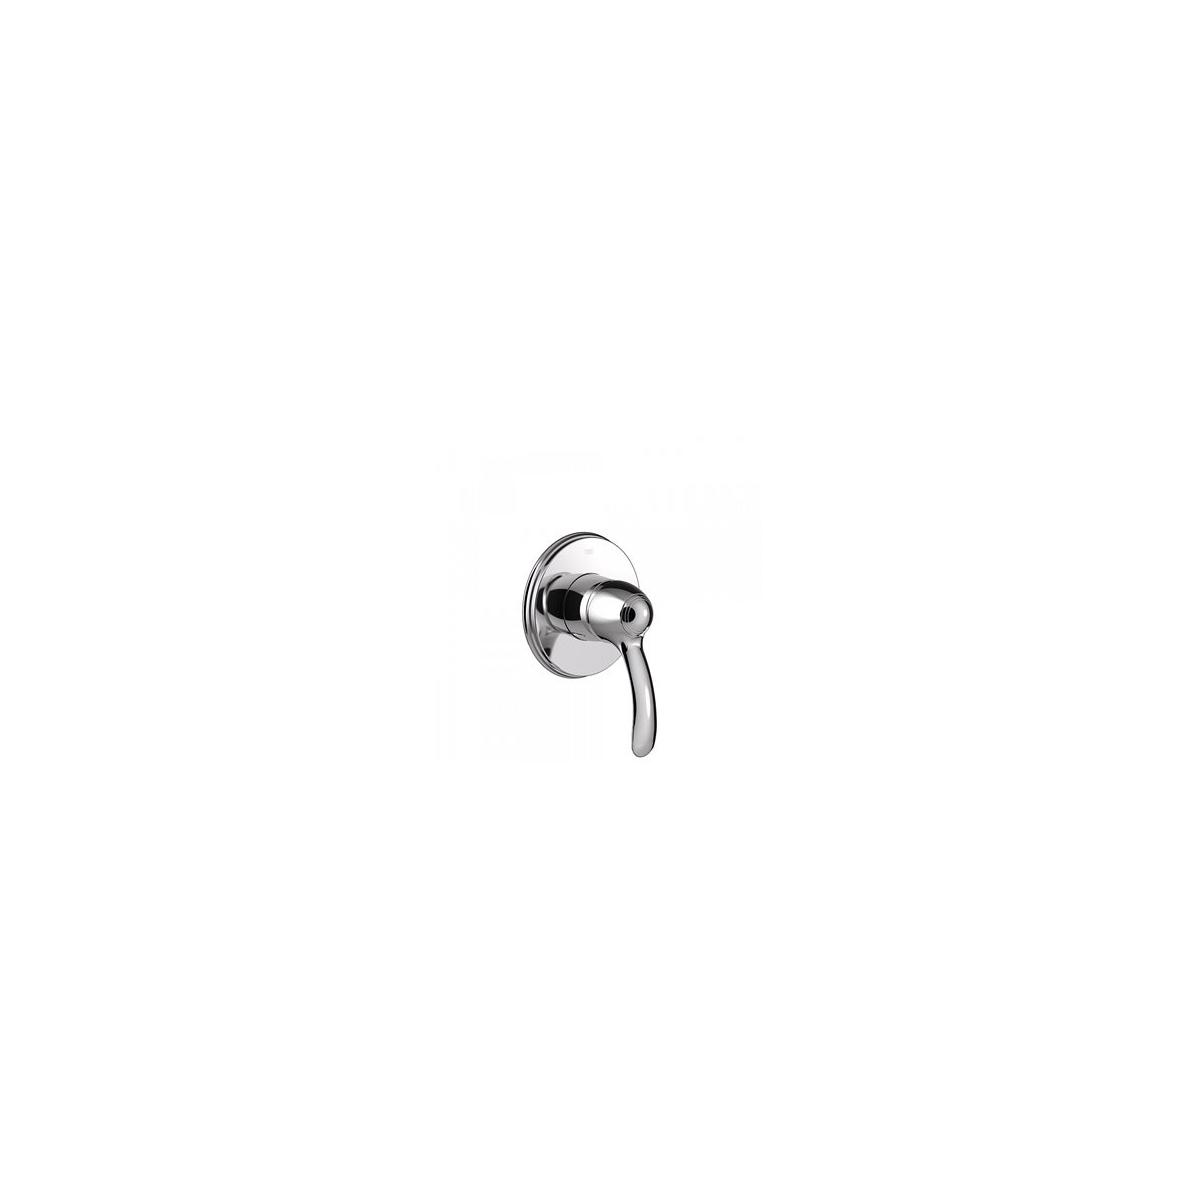 Grifo Monomando empotrado ducha Tres